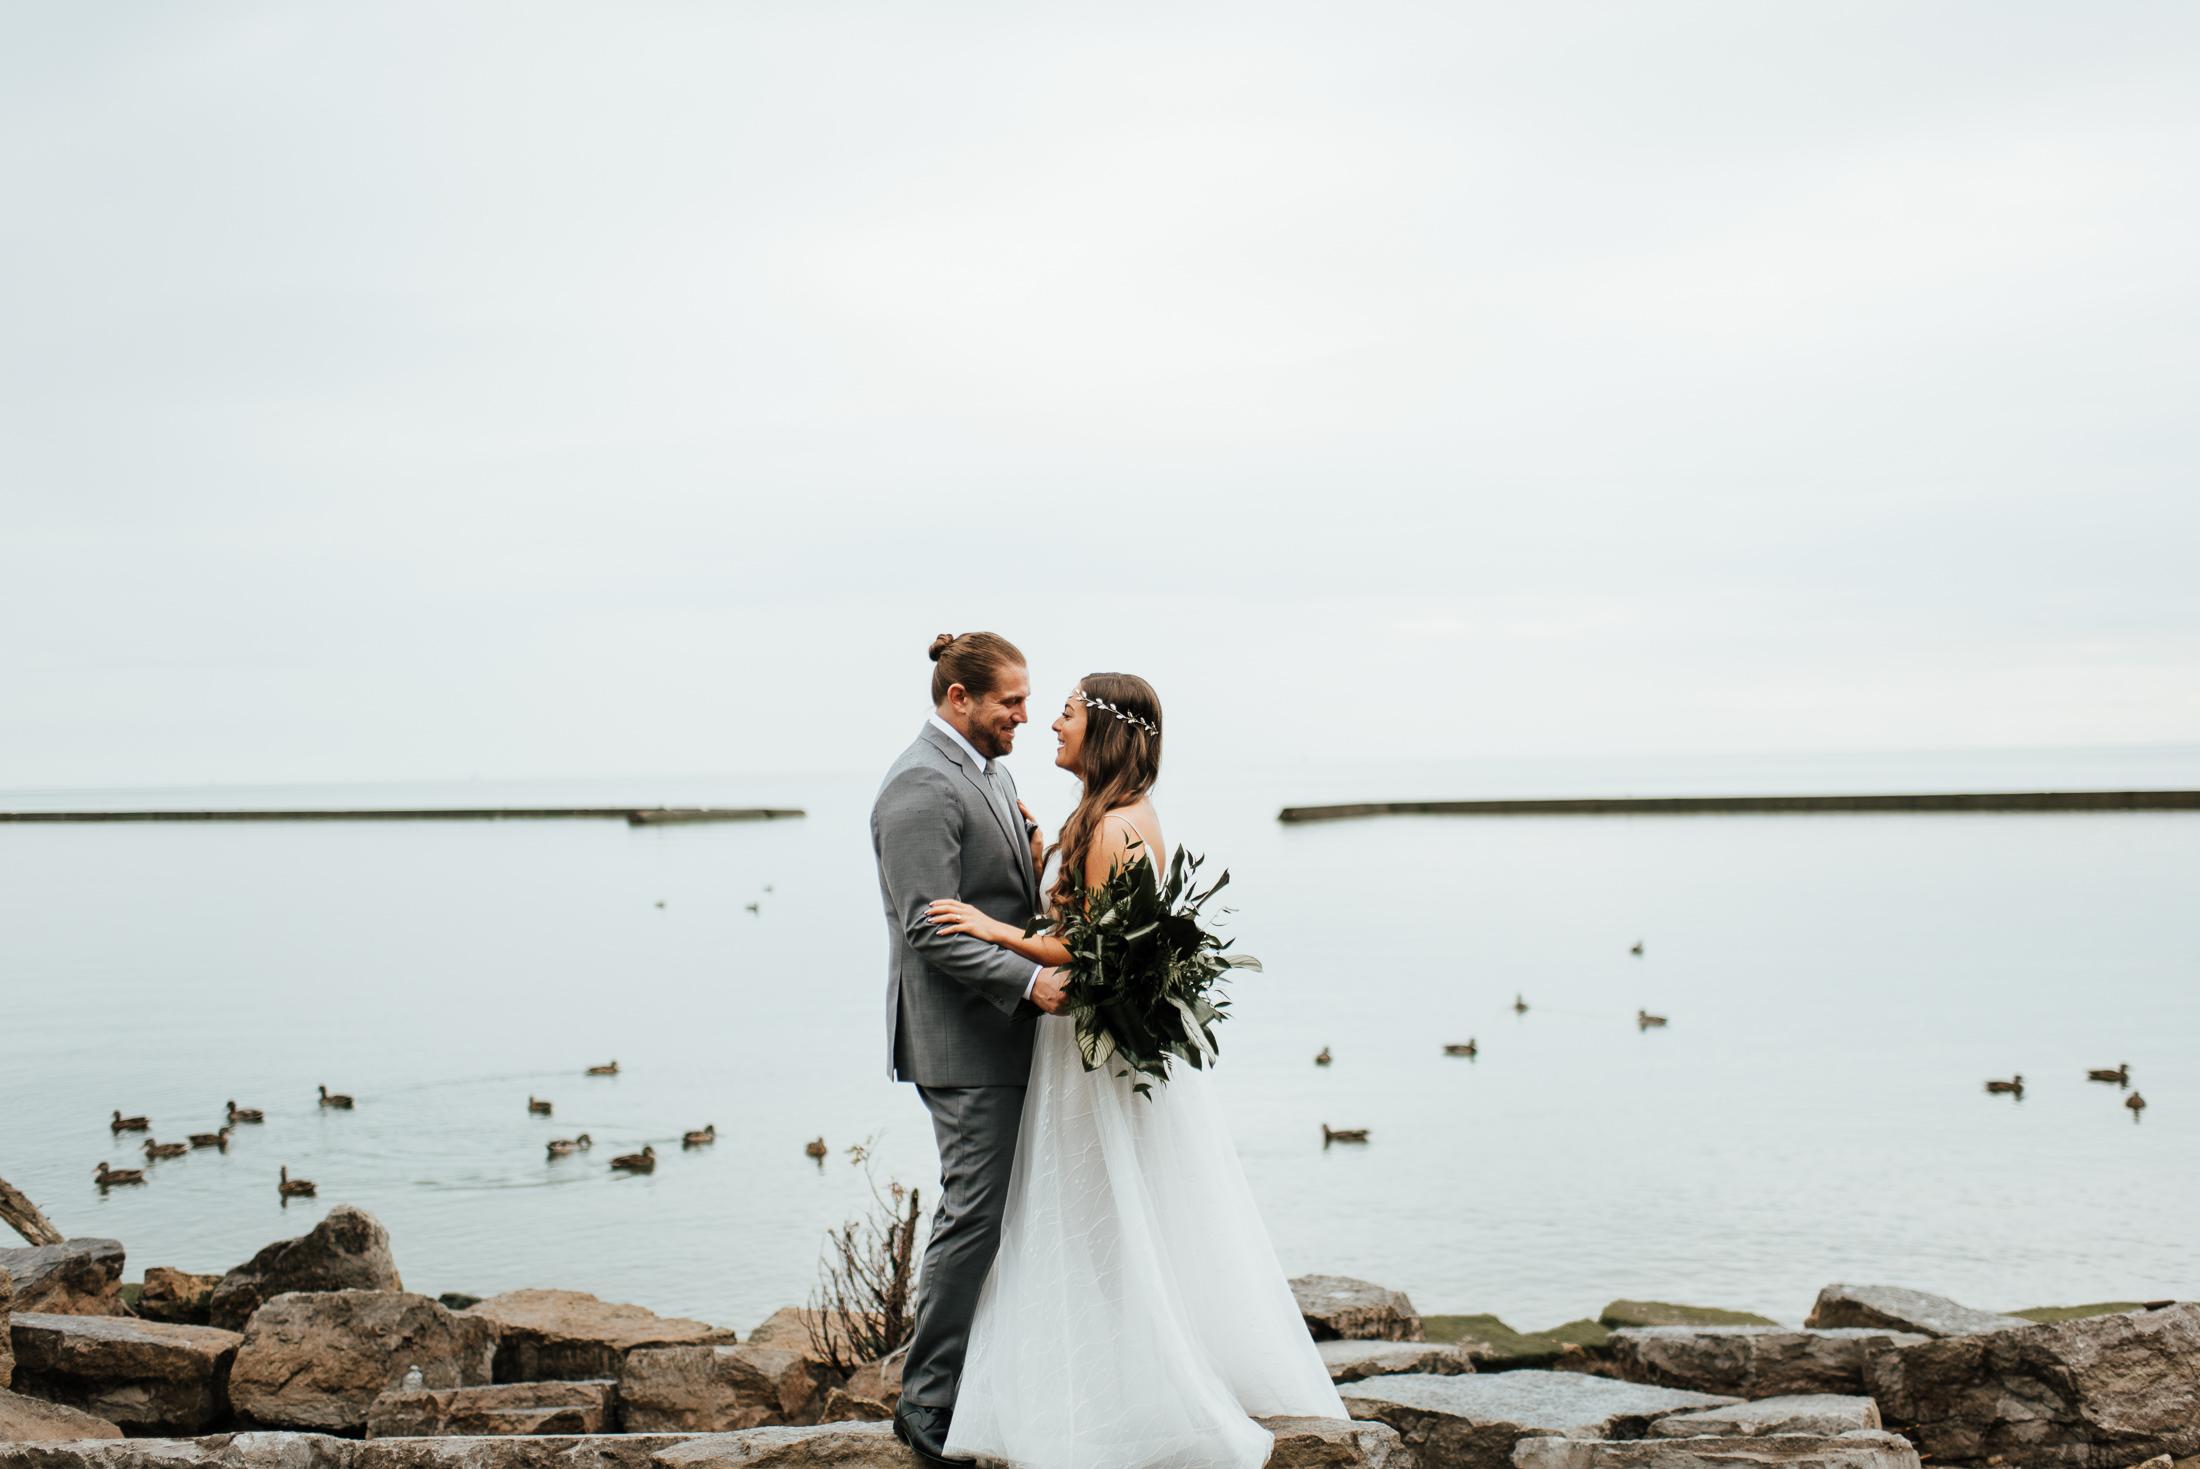 Wedding by the lake ontario